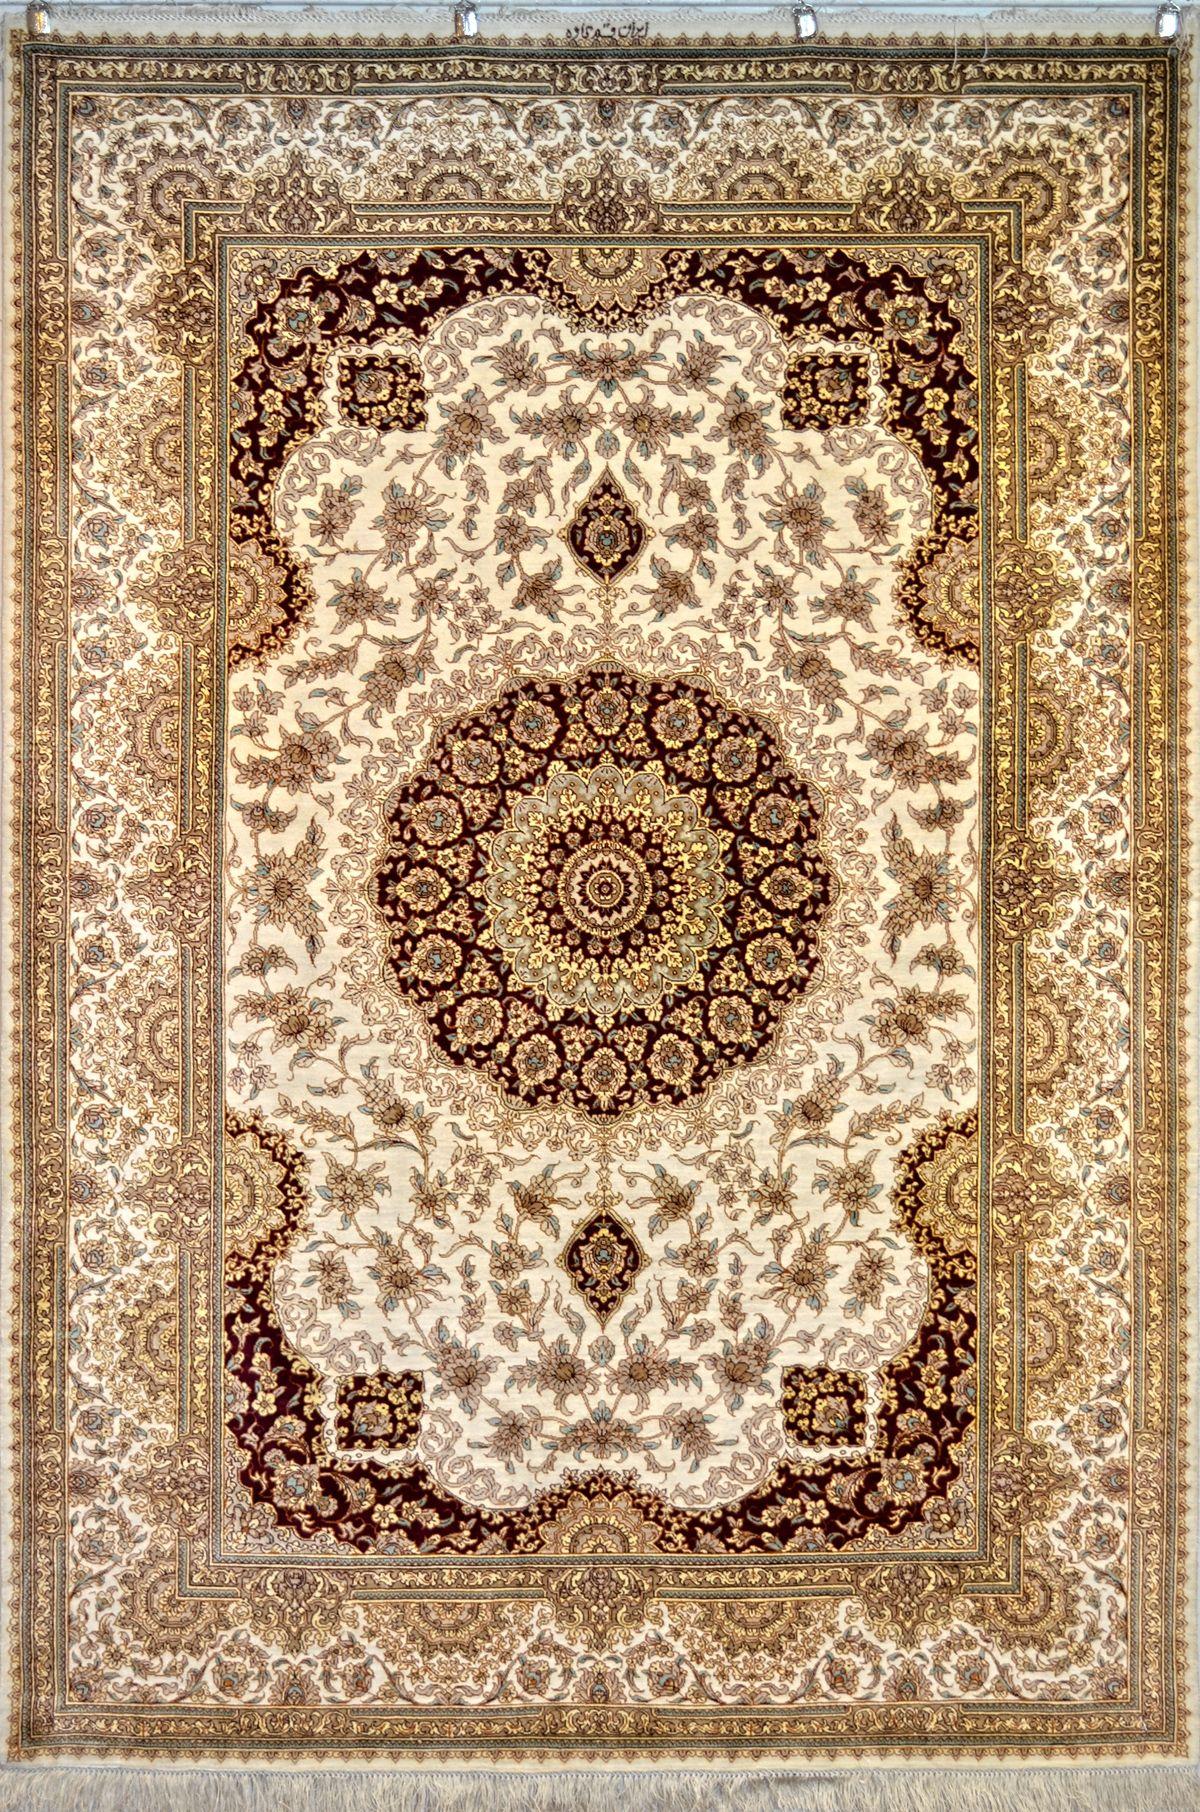 Kaveh Signed Qum Qom Silk Persian Rug You Pay 6 900 00 Retail Price 13 800